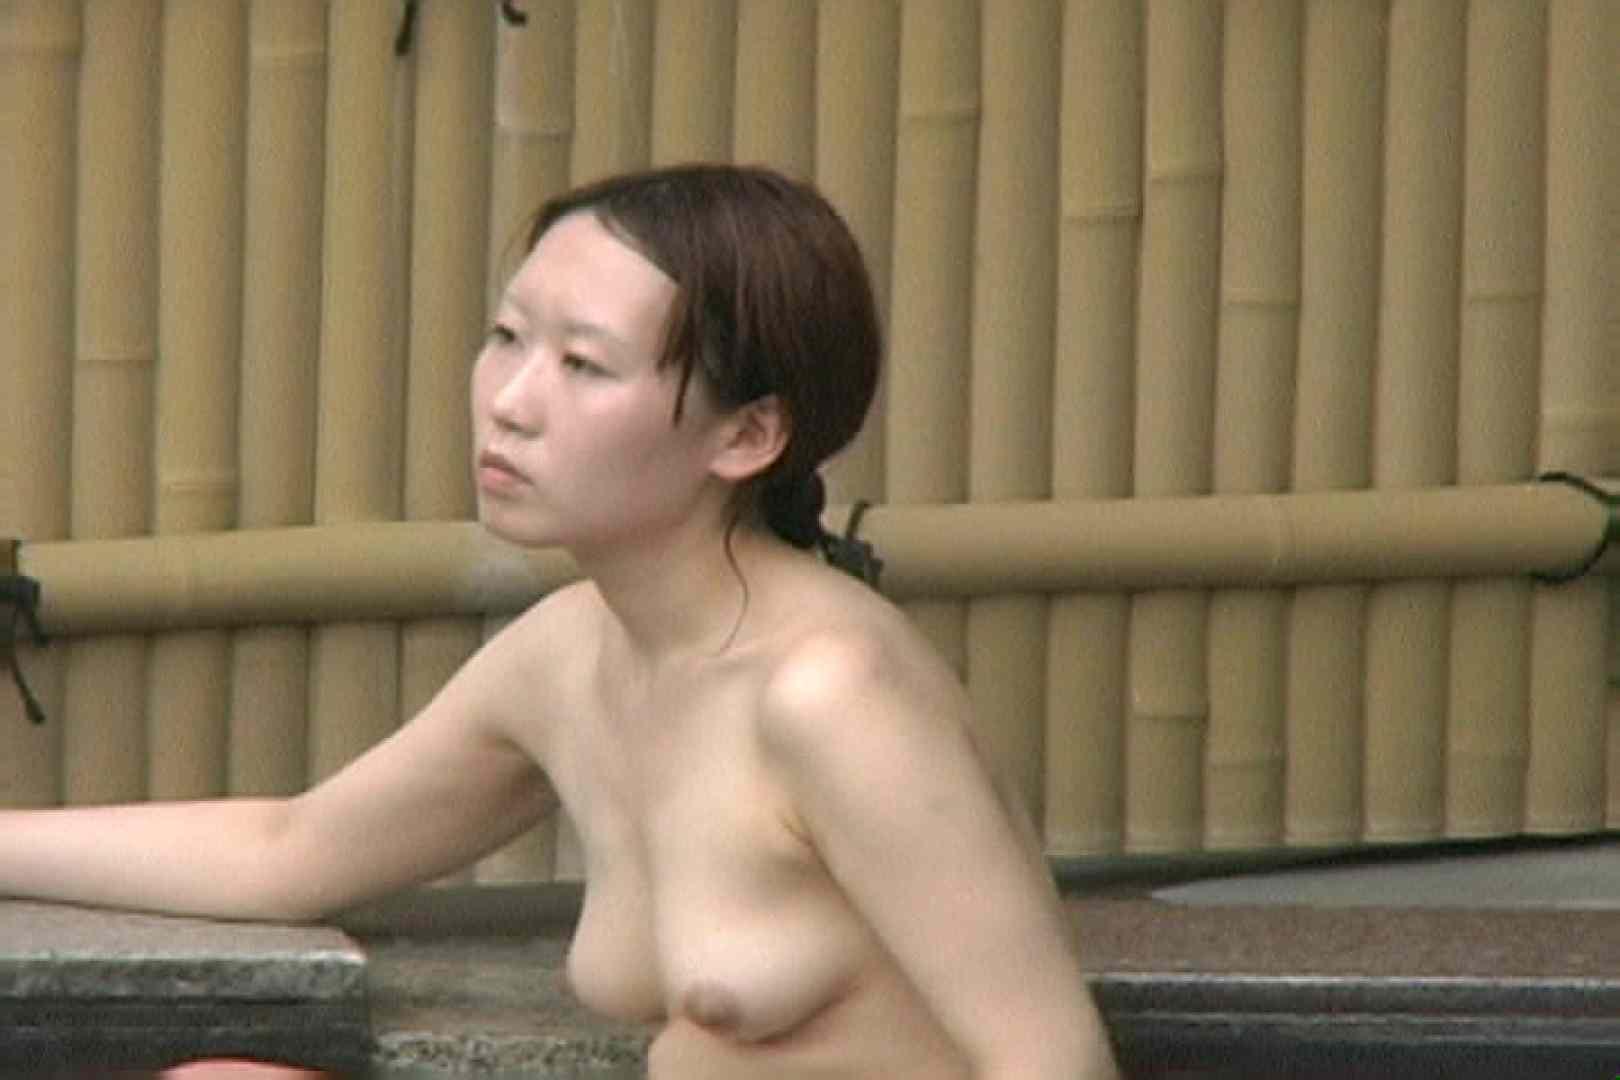 Aquaな露天風呂Vol.10【VIP】 露天風呂編 | 盗撮シリーズ  95PIX 69